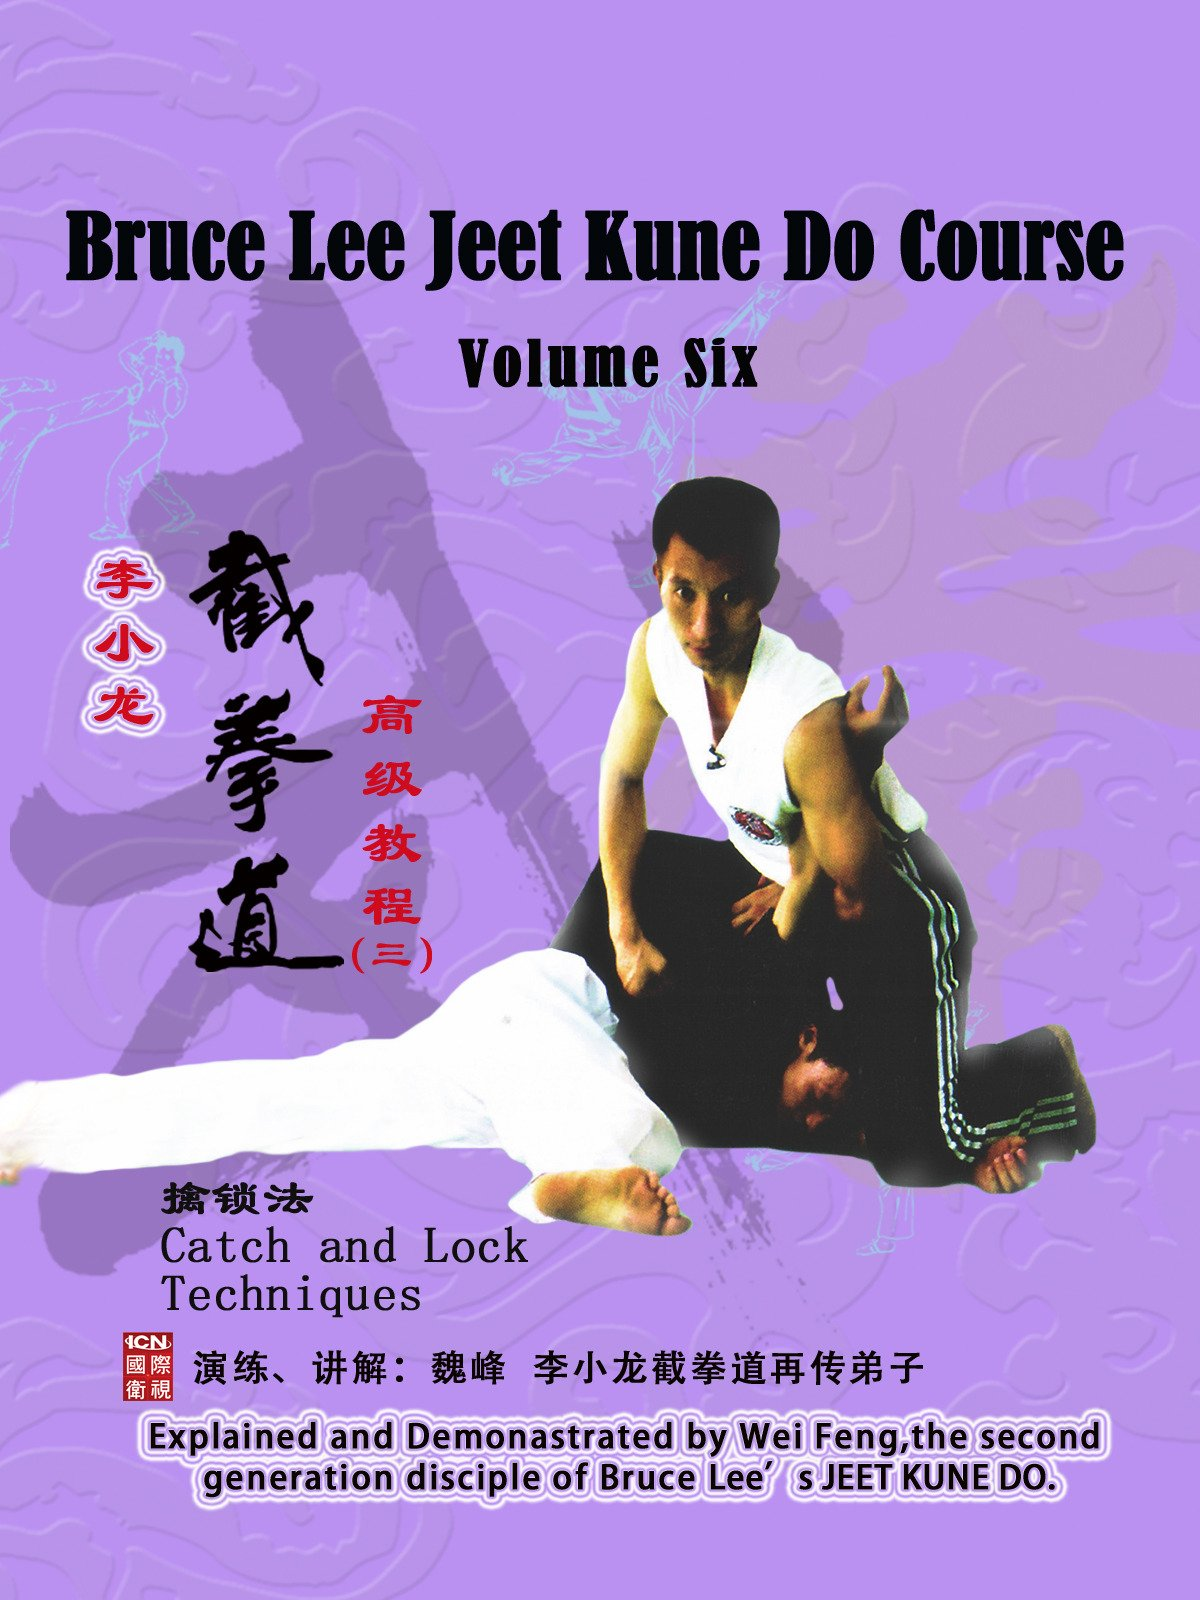 Bruce Lee Jeet Kune Do Course Volume Six